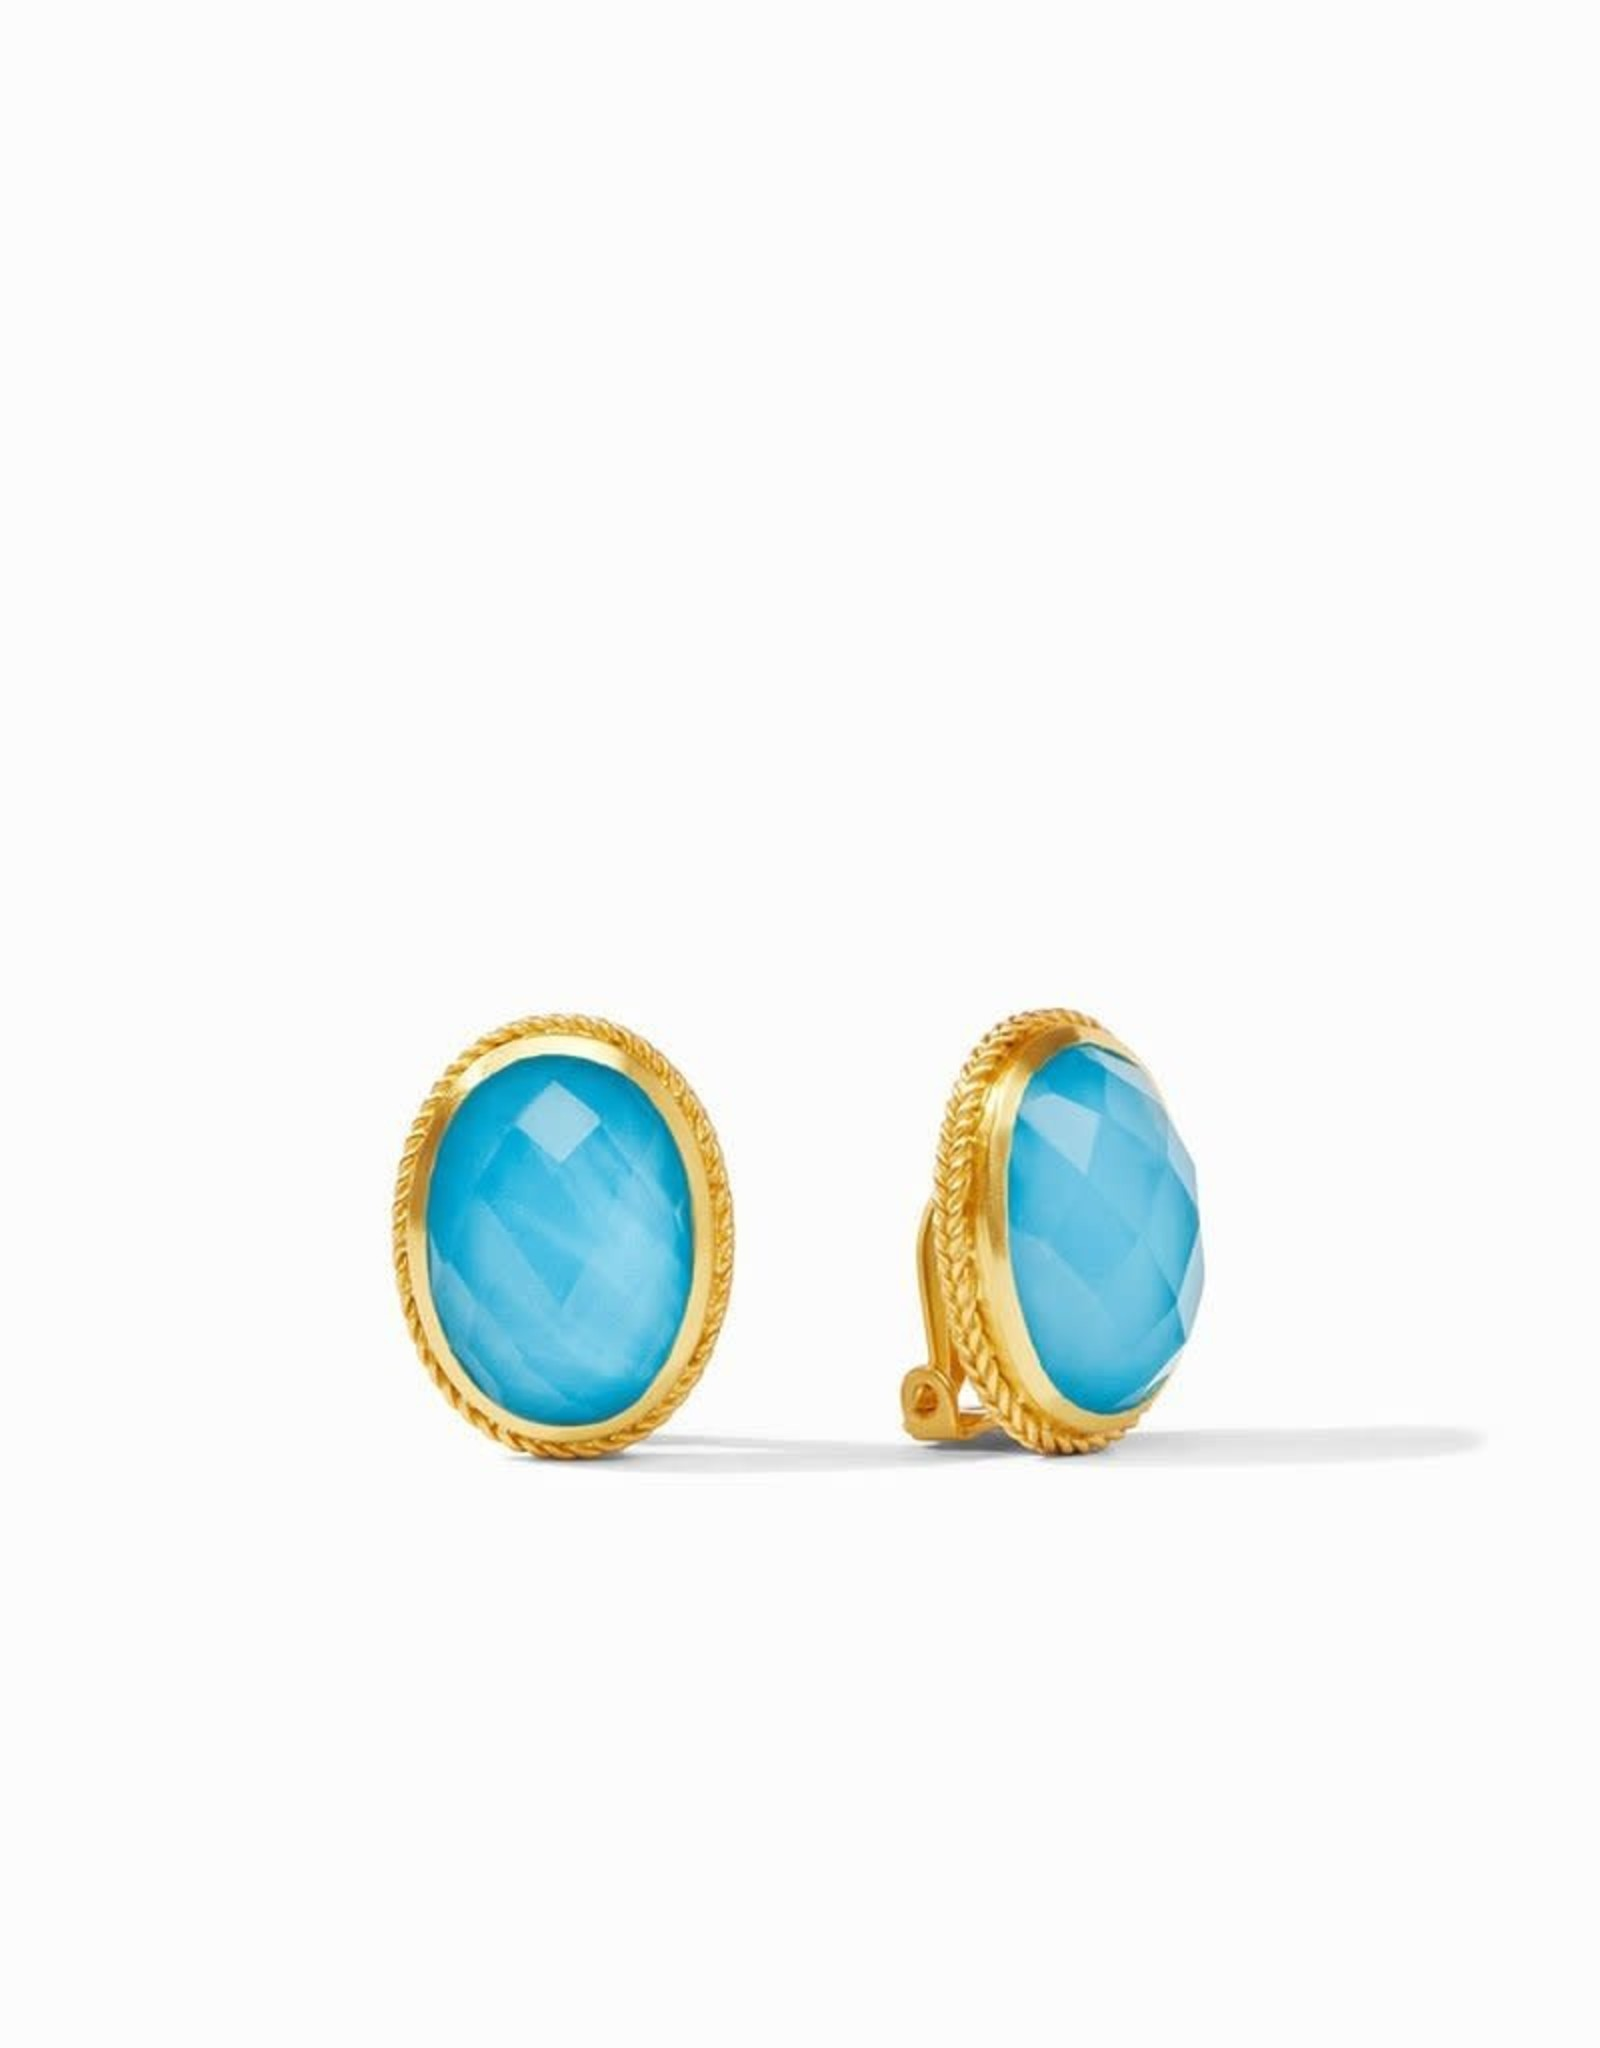 Julie Vos Julie Vos Verona Clip-On Earring Iridescent Turquoise